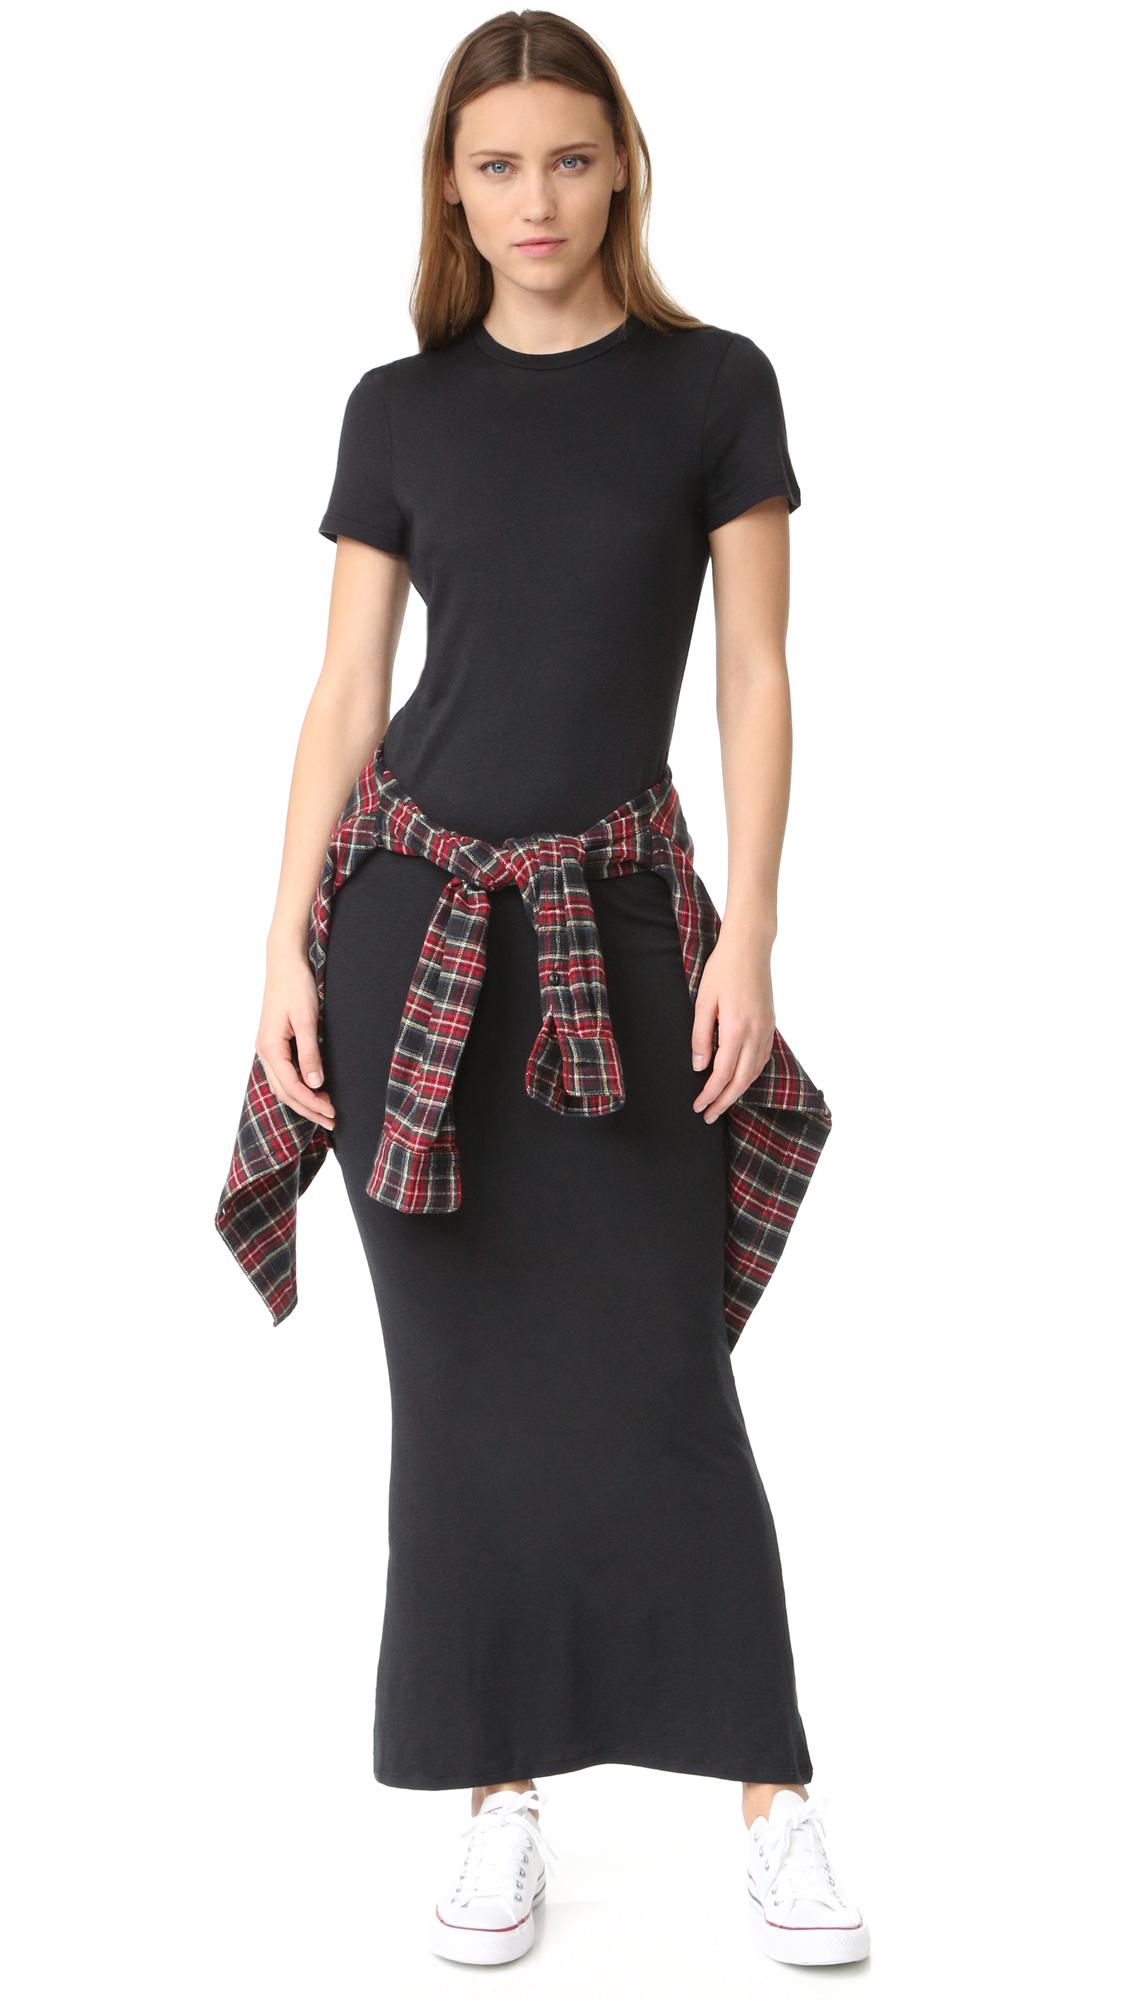 Black black t shirt maxi dress - Black Black T Shirt Maxi Dress 31